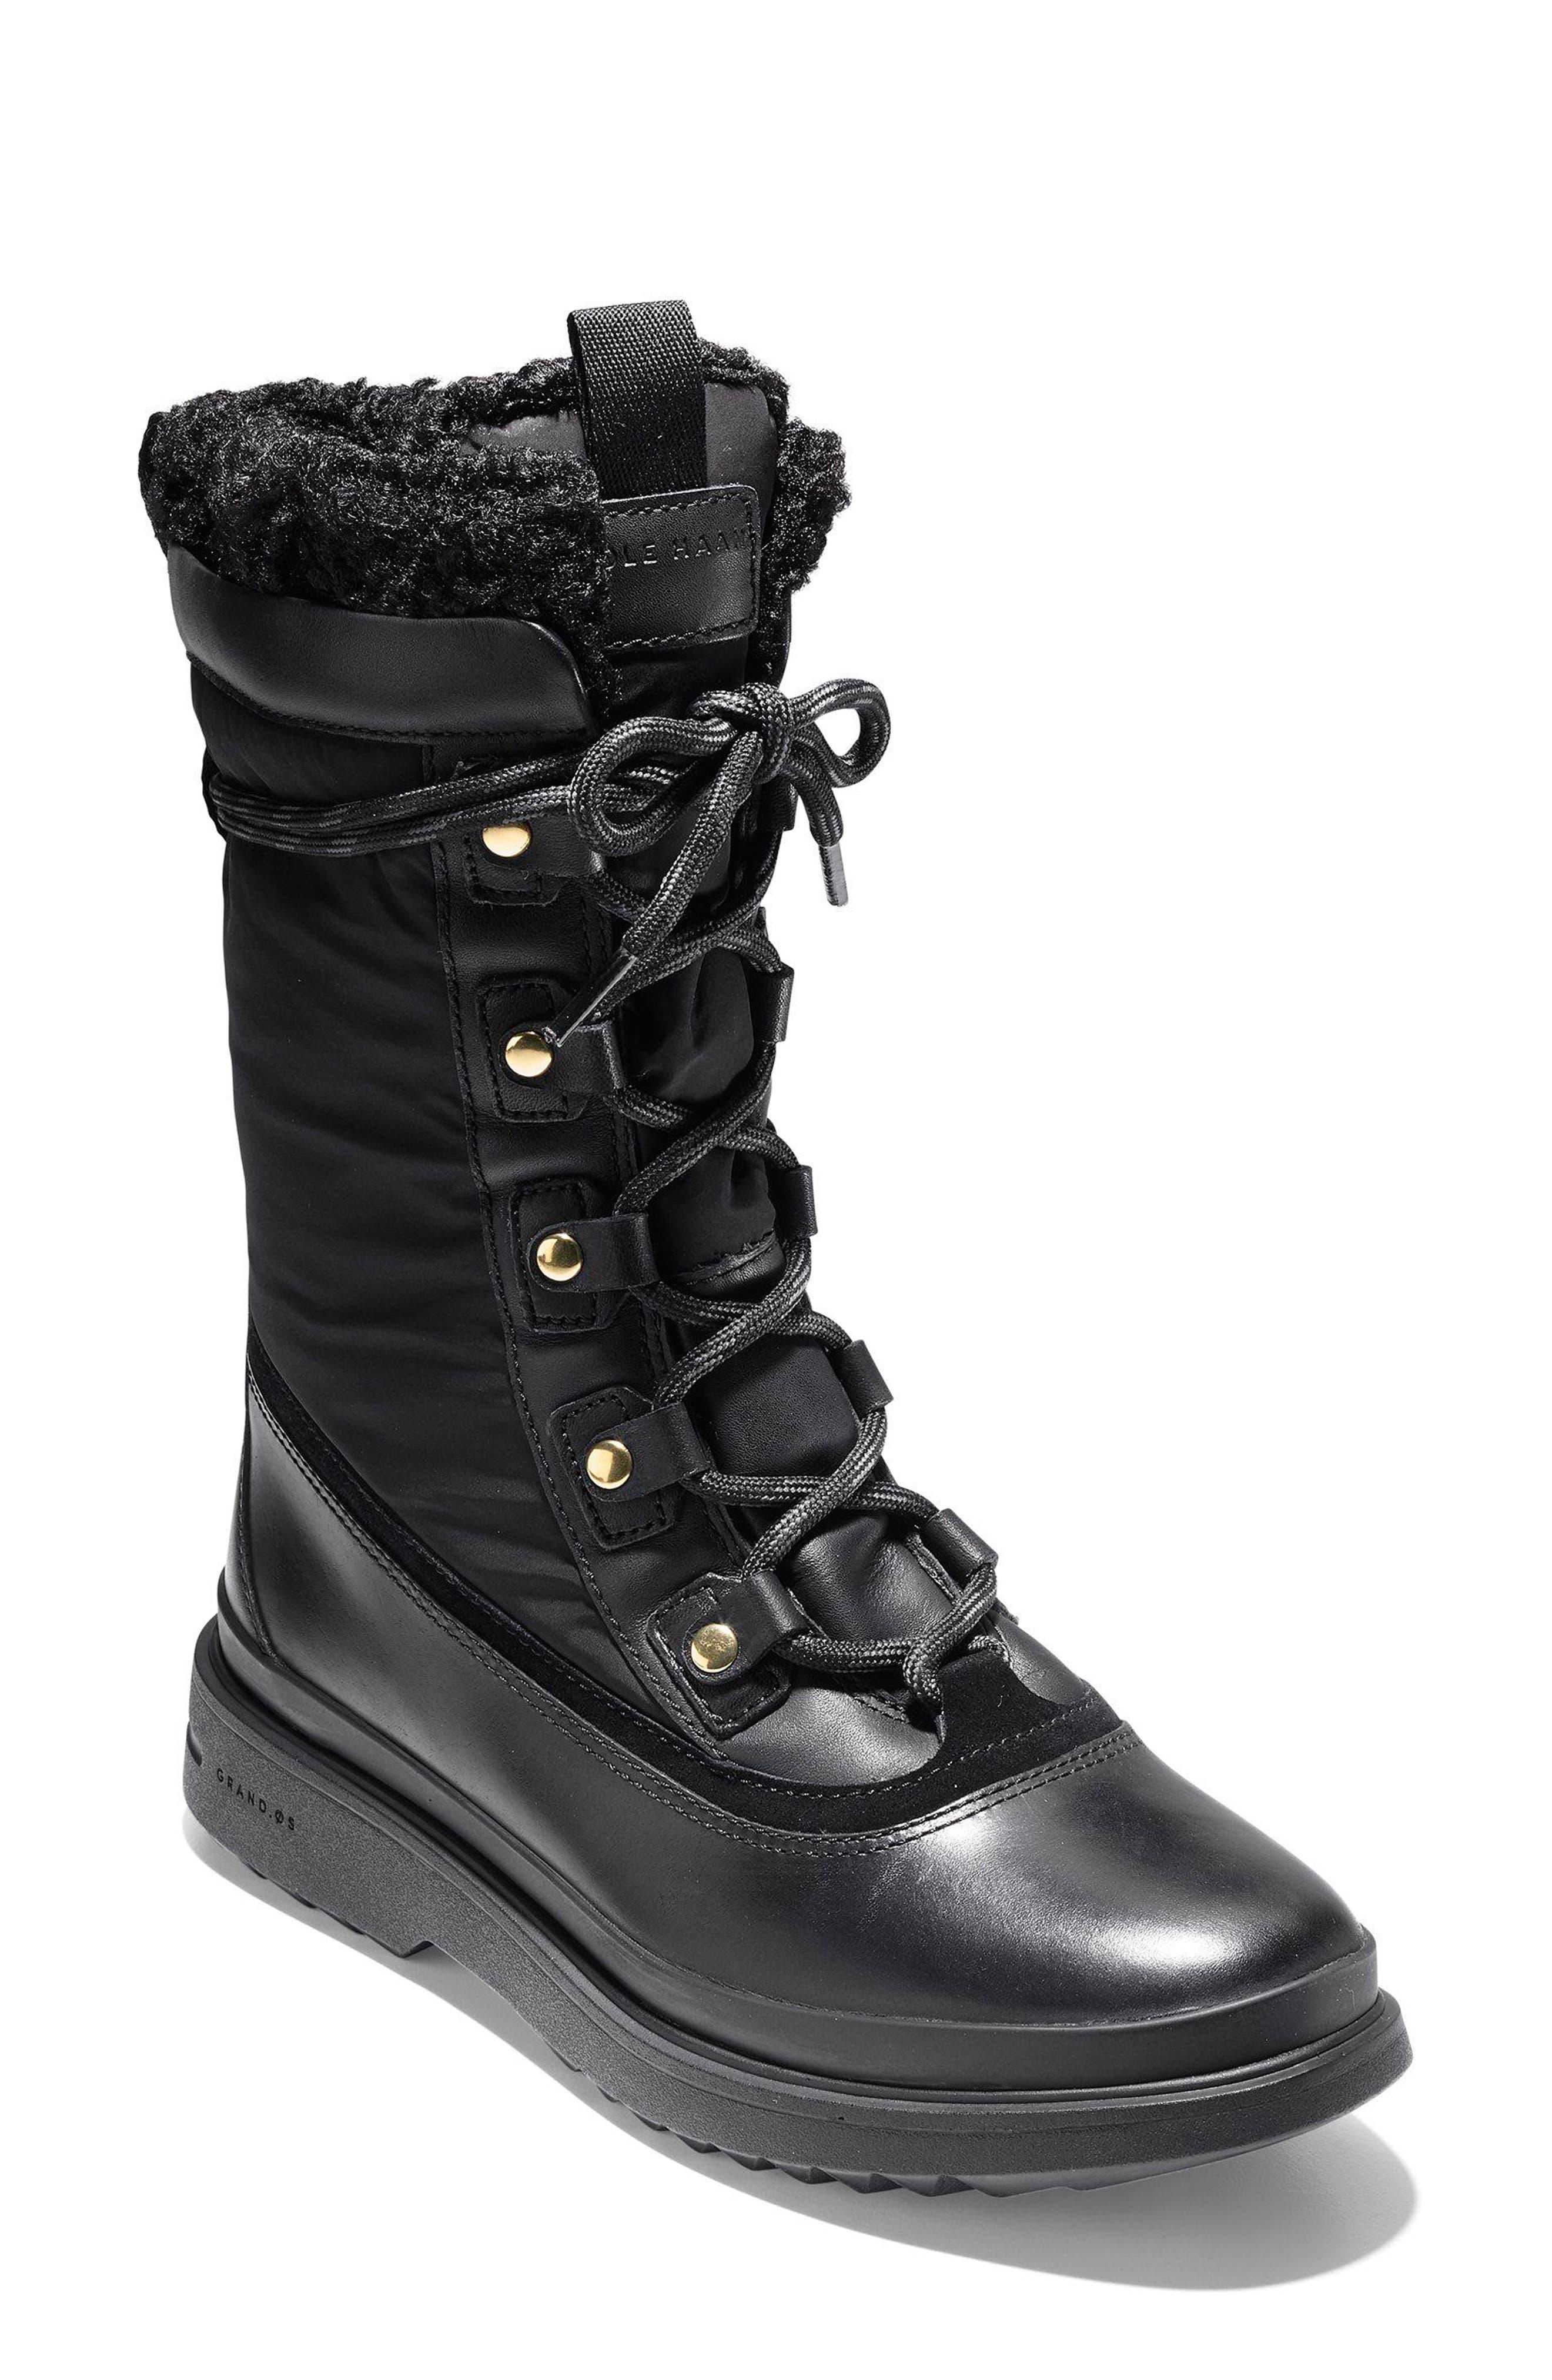 Millbridge Waterproof Boot,                             Main thumbnail 1, color,                             Black Leather